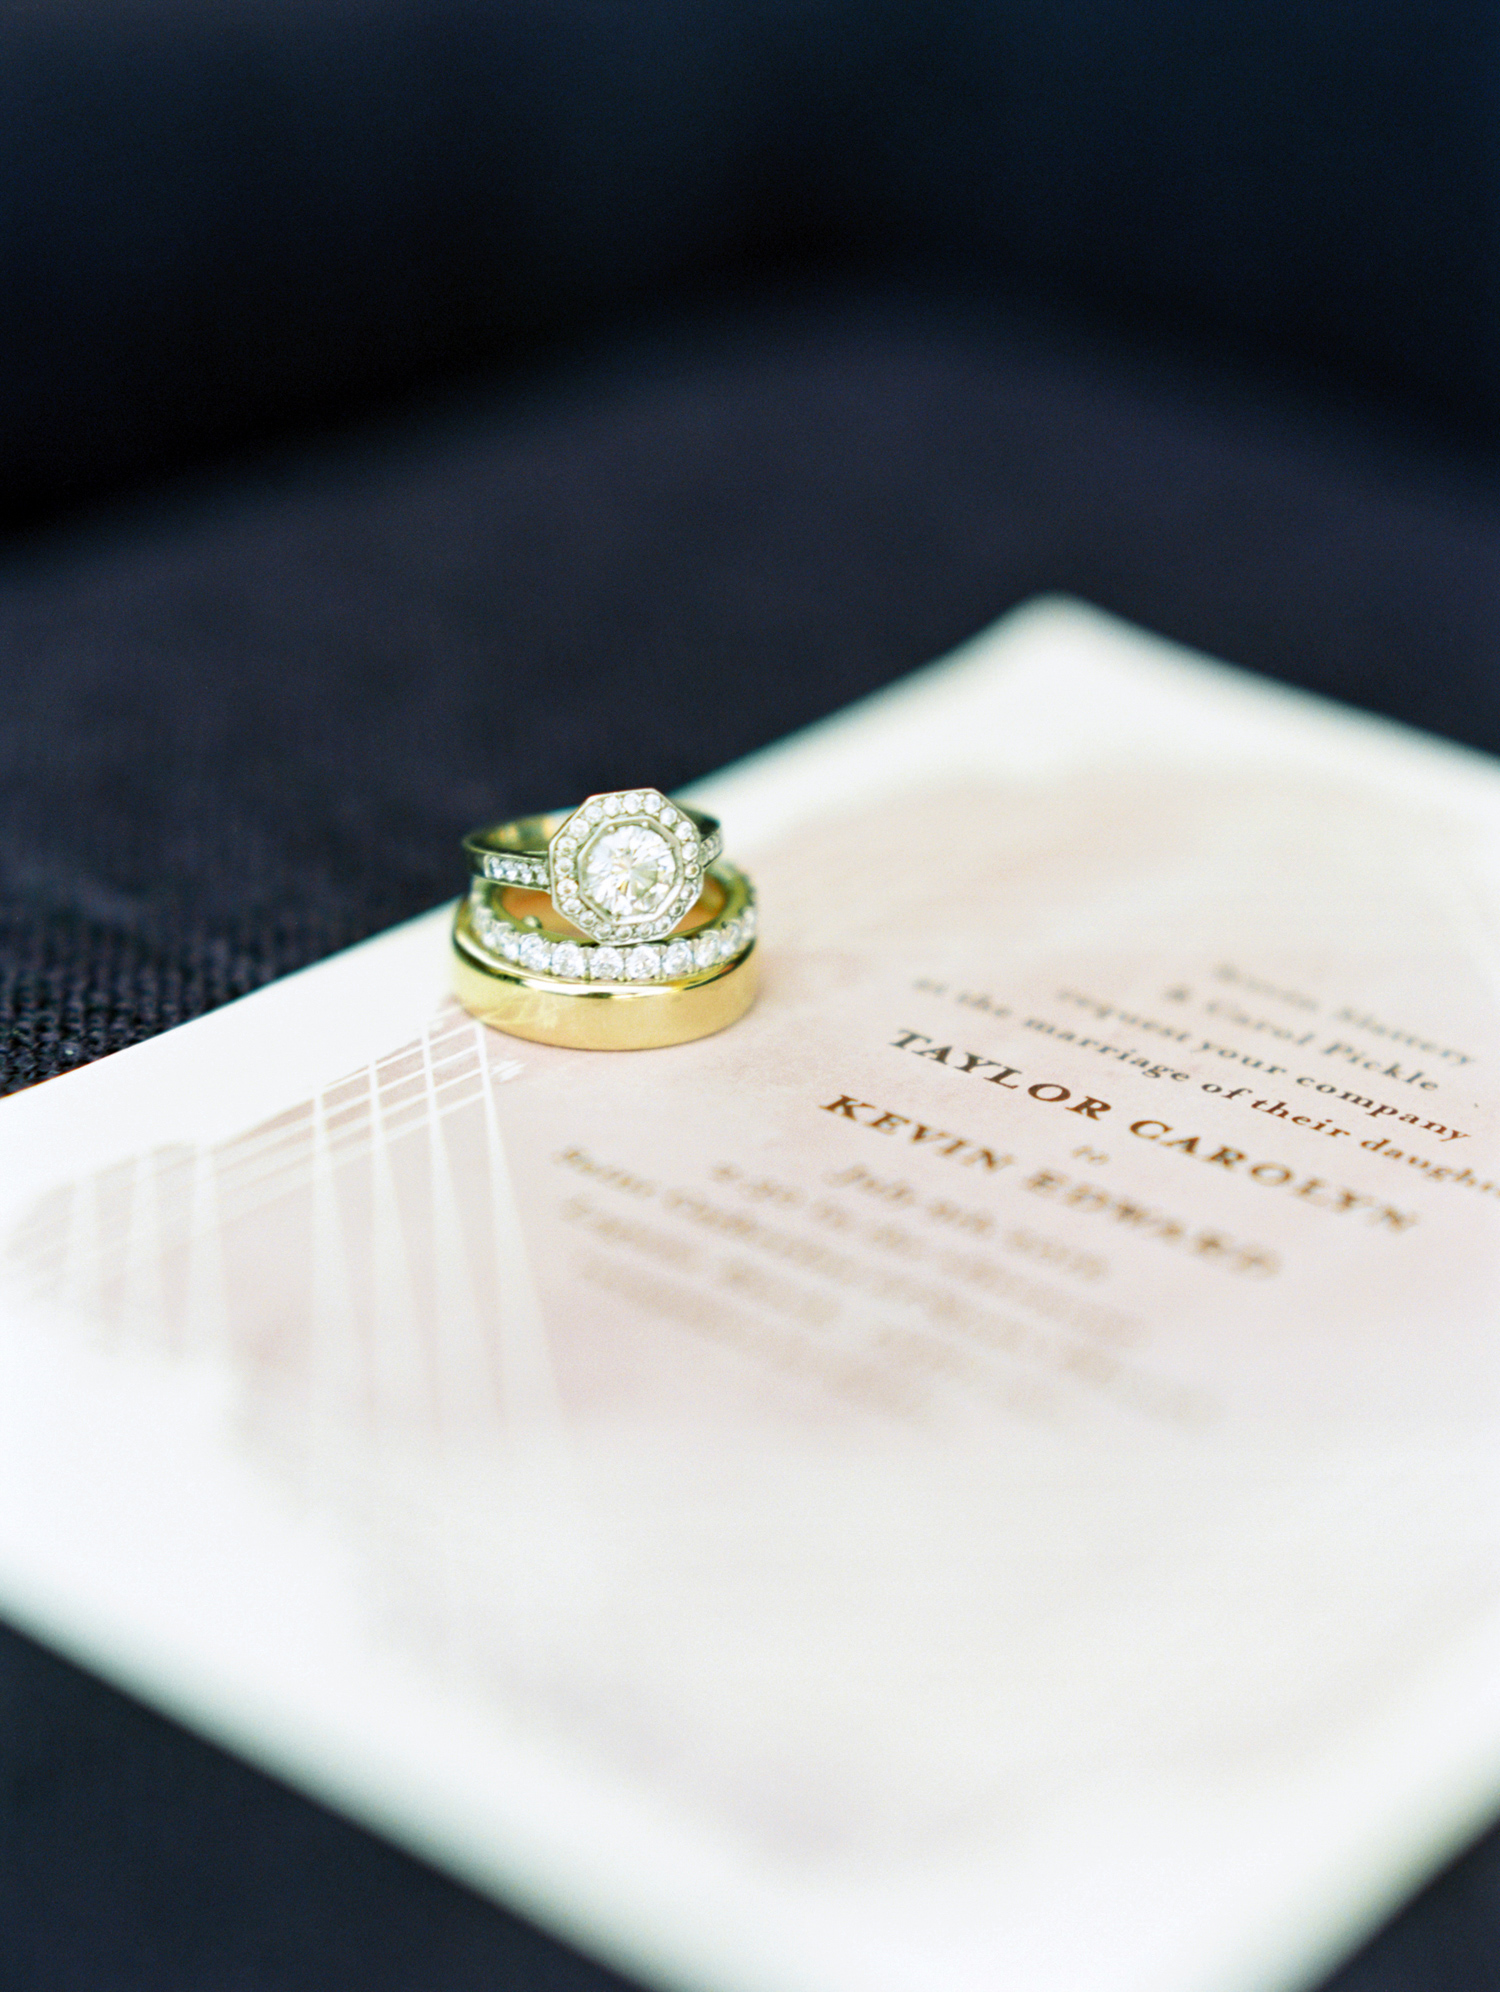 048-Jen-Wojcik-Photography-San-Diego-Wedding-Photographer.jpg